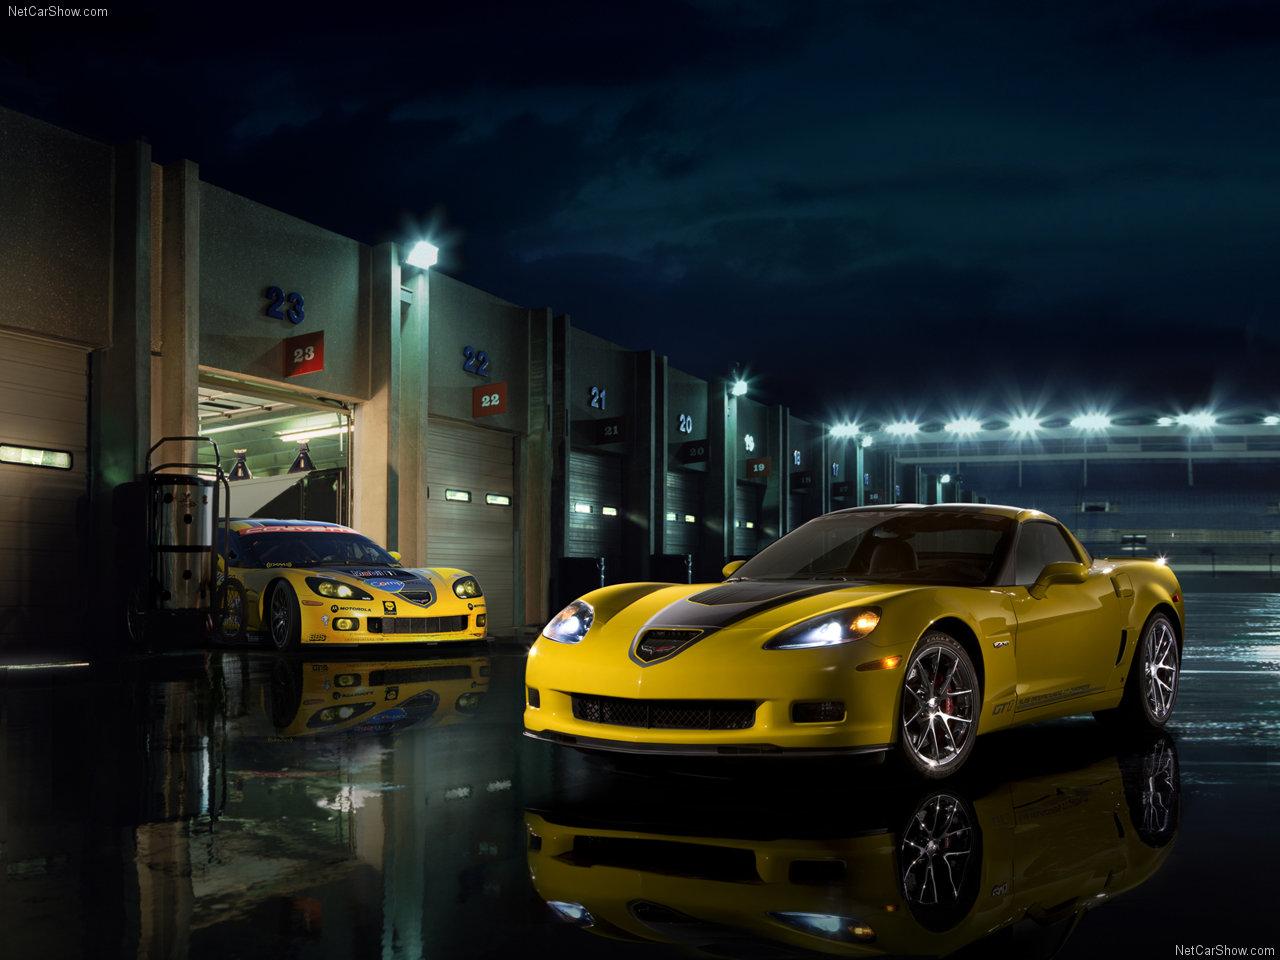 http://3.bp.blogspot.com/-UNTIVihicW4/TW9vBFi9ckI/AAAAAAAALnw/MKSYqspBgn0/s1600/Chevrolet-Corvette_GT1_2009_1280x960_wallpaper_01.jpg